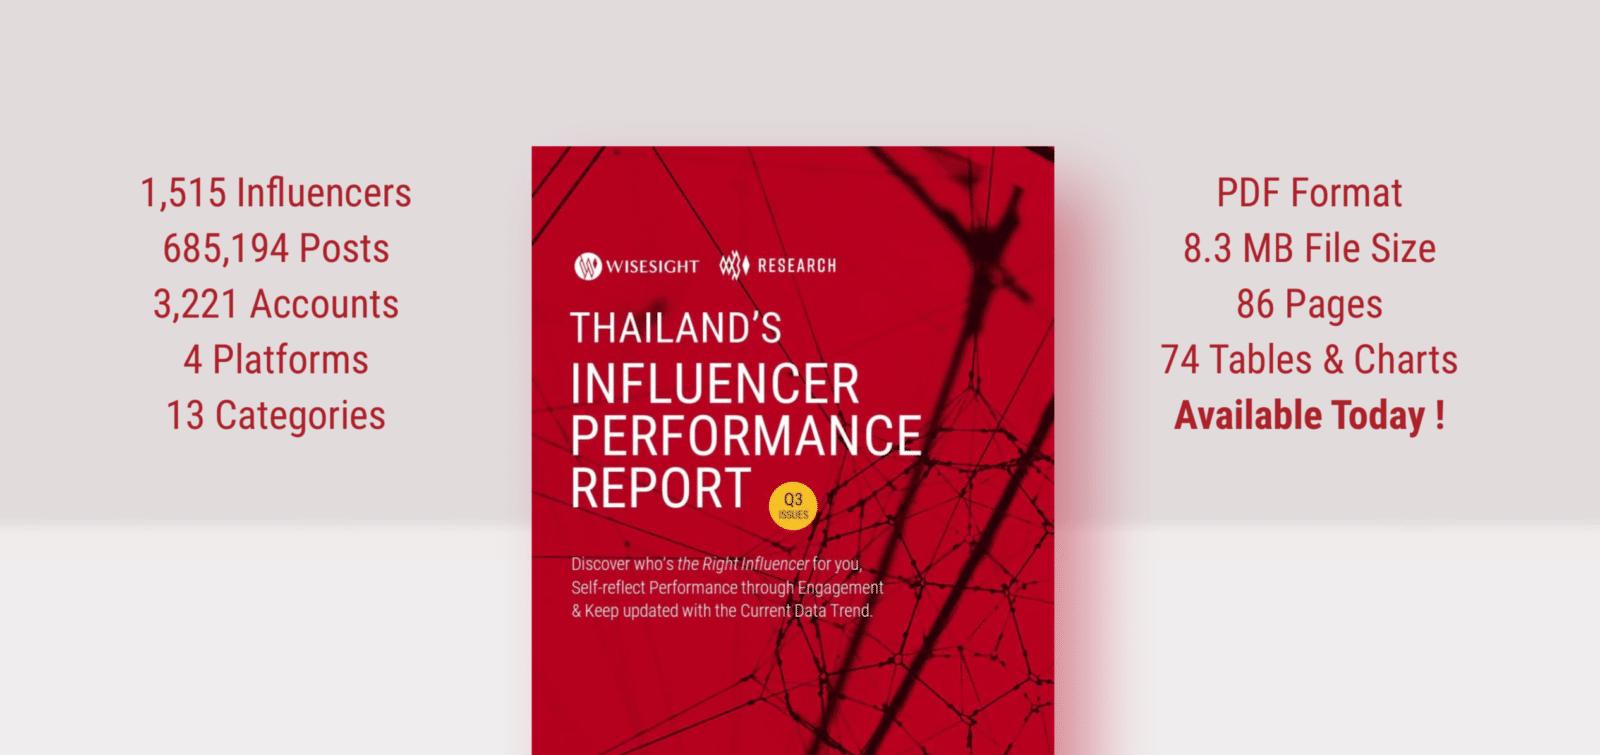 Wisesight  เปิดตัว Influencer Performance Report Q3 รวมทุกข้อมูล เทคนิคเก็บข้อมูลใหม่